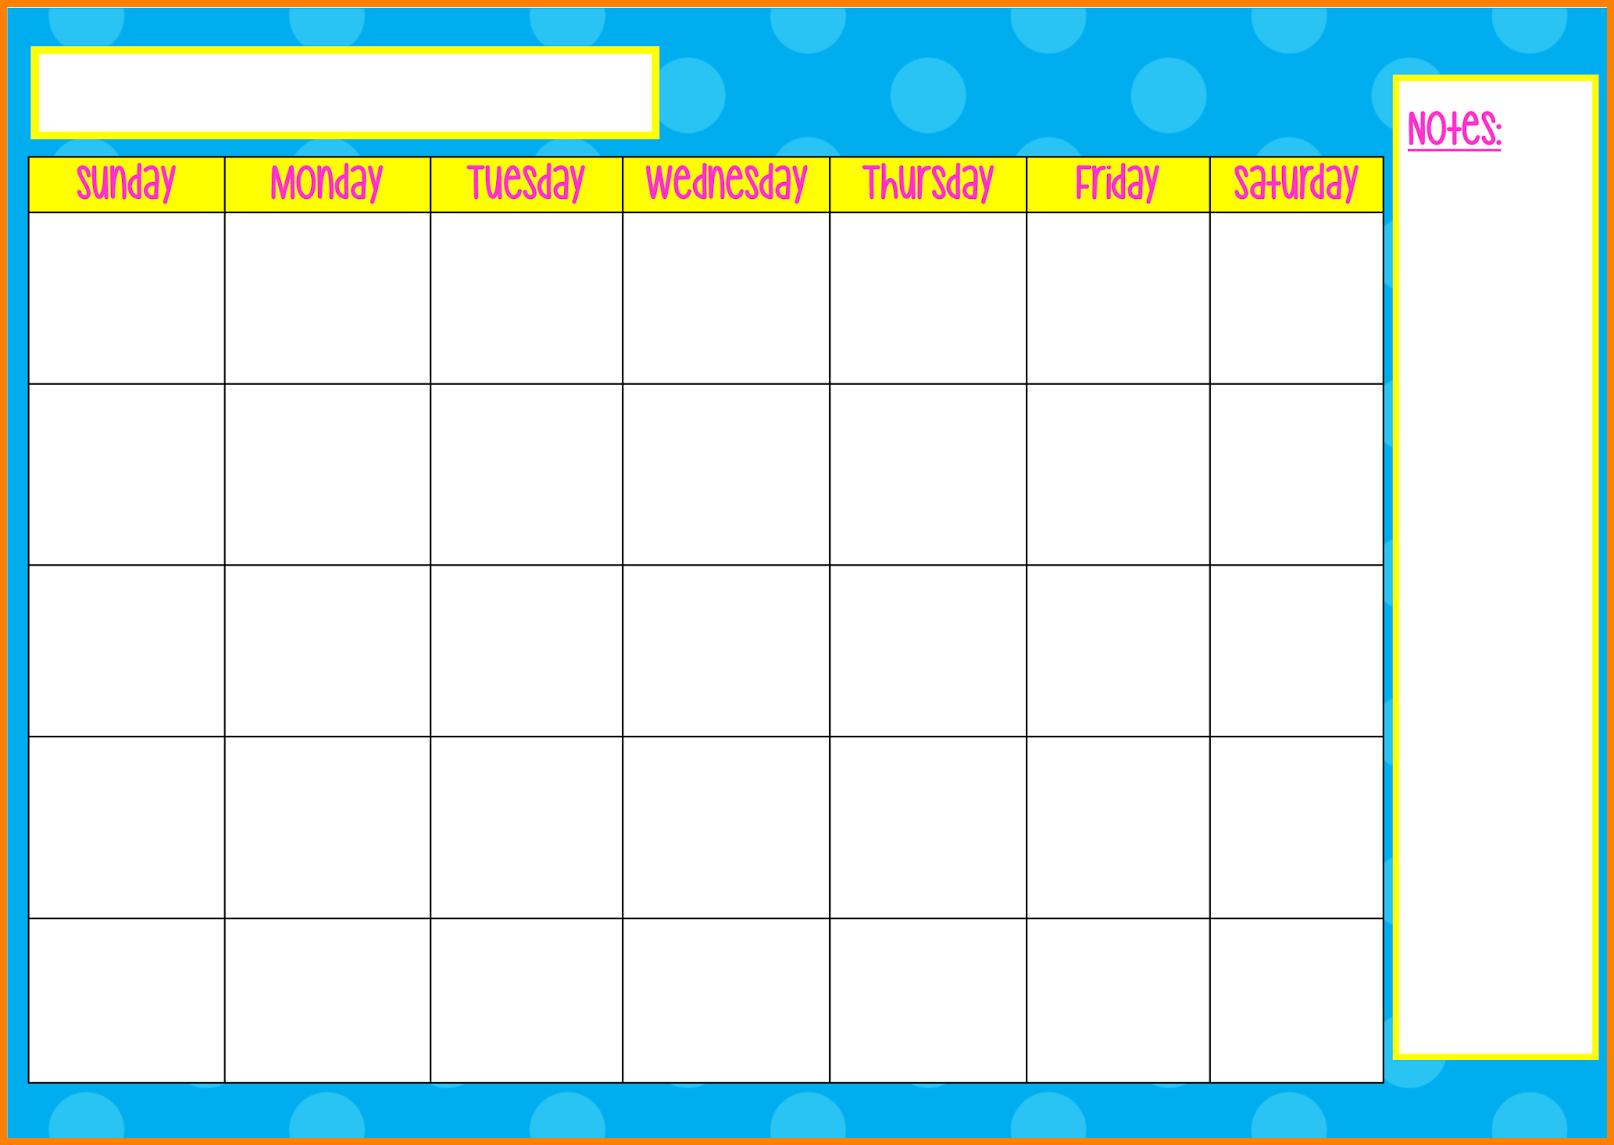 10+ Monday Thru Friday - Card Authorization 2017 Template Momday To Friday